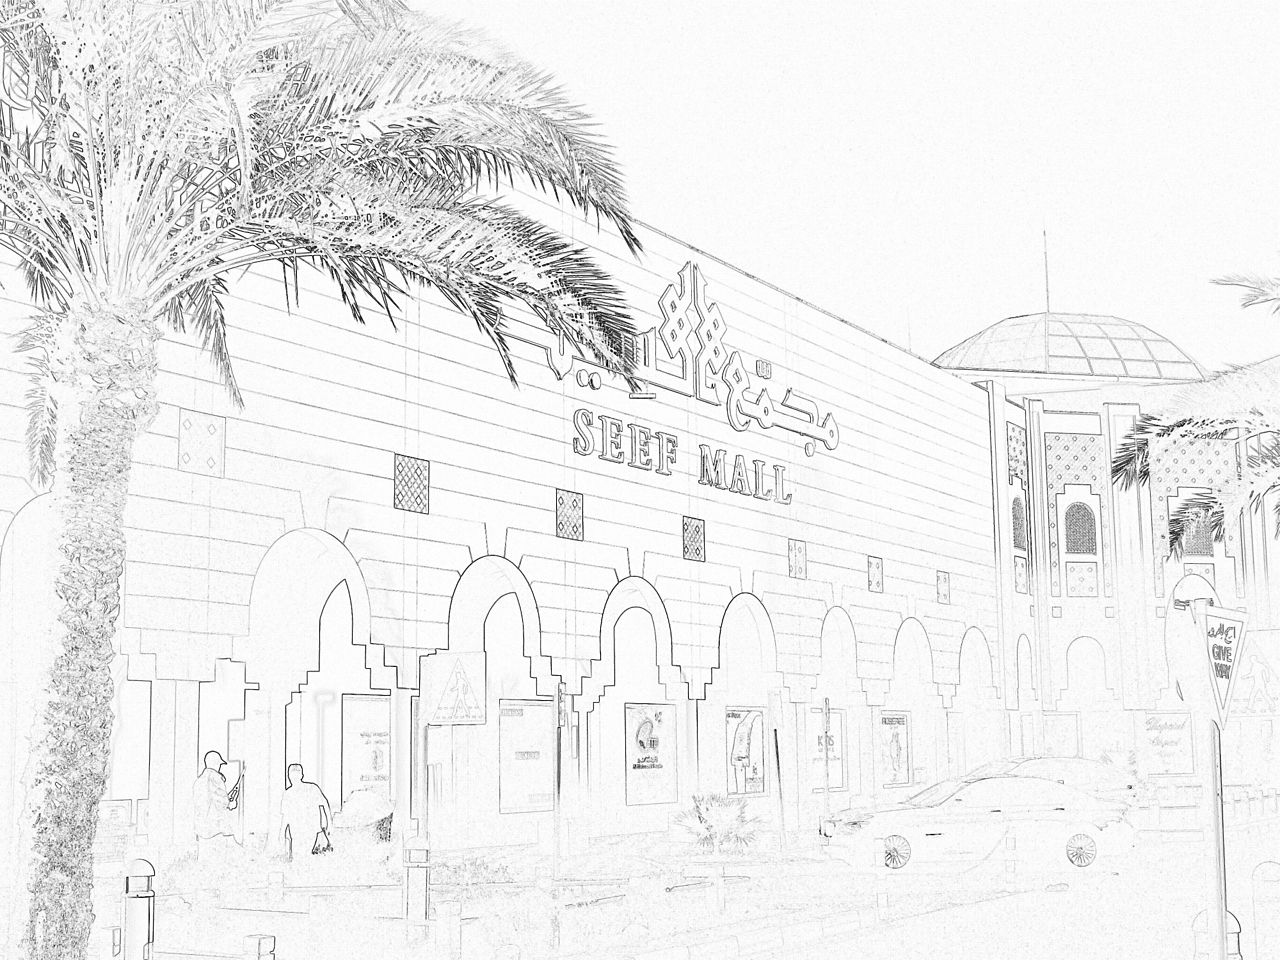 FileSeef Mall Manama Bahrain DrawingJPG Wikimedia